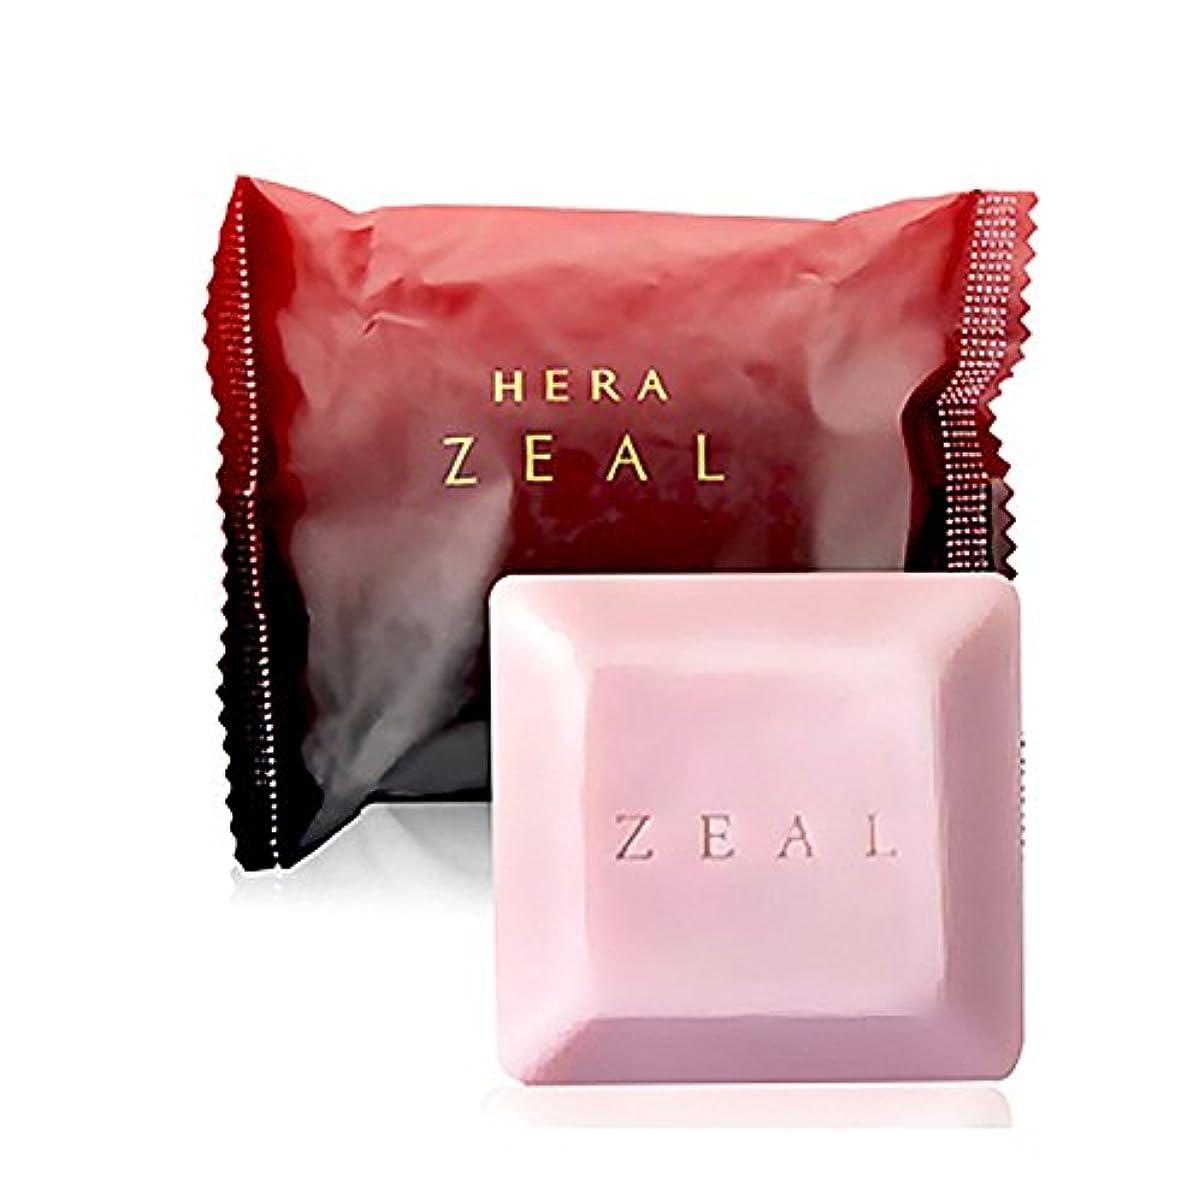 HERA ZEAL 美容石鹸 60gソープ/Hera Zeal Organic Perfumed Soap